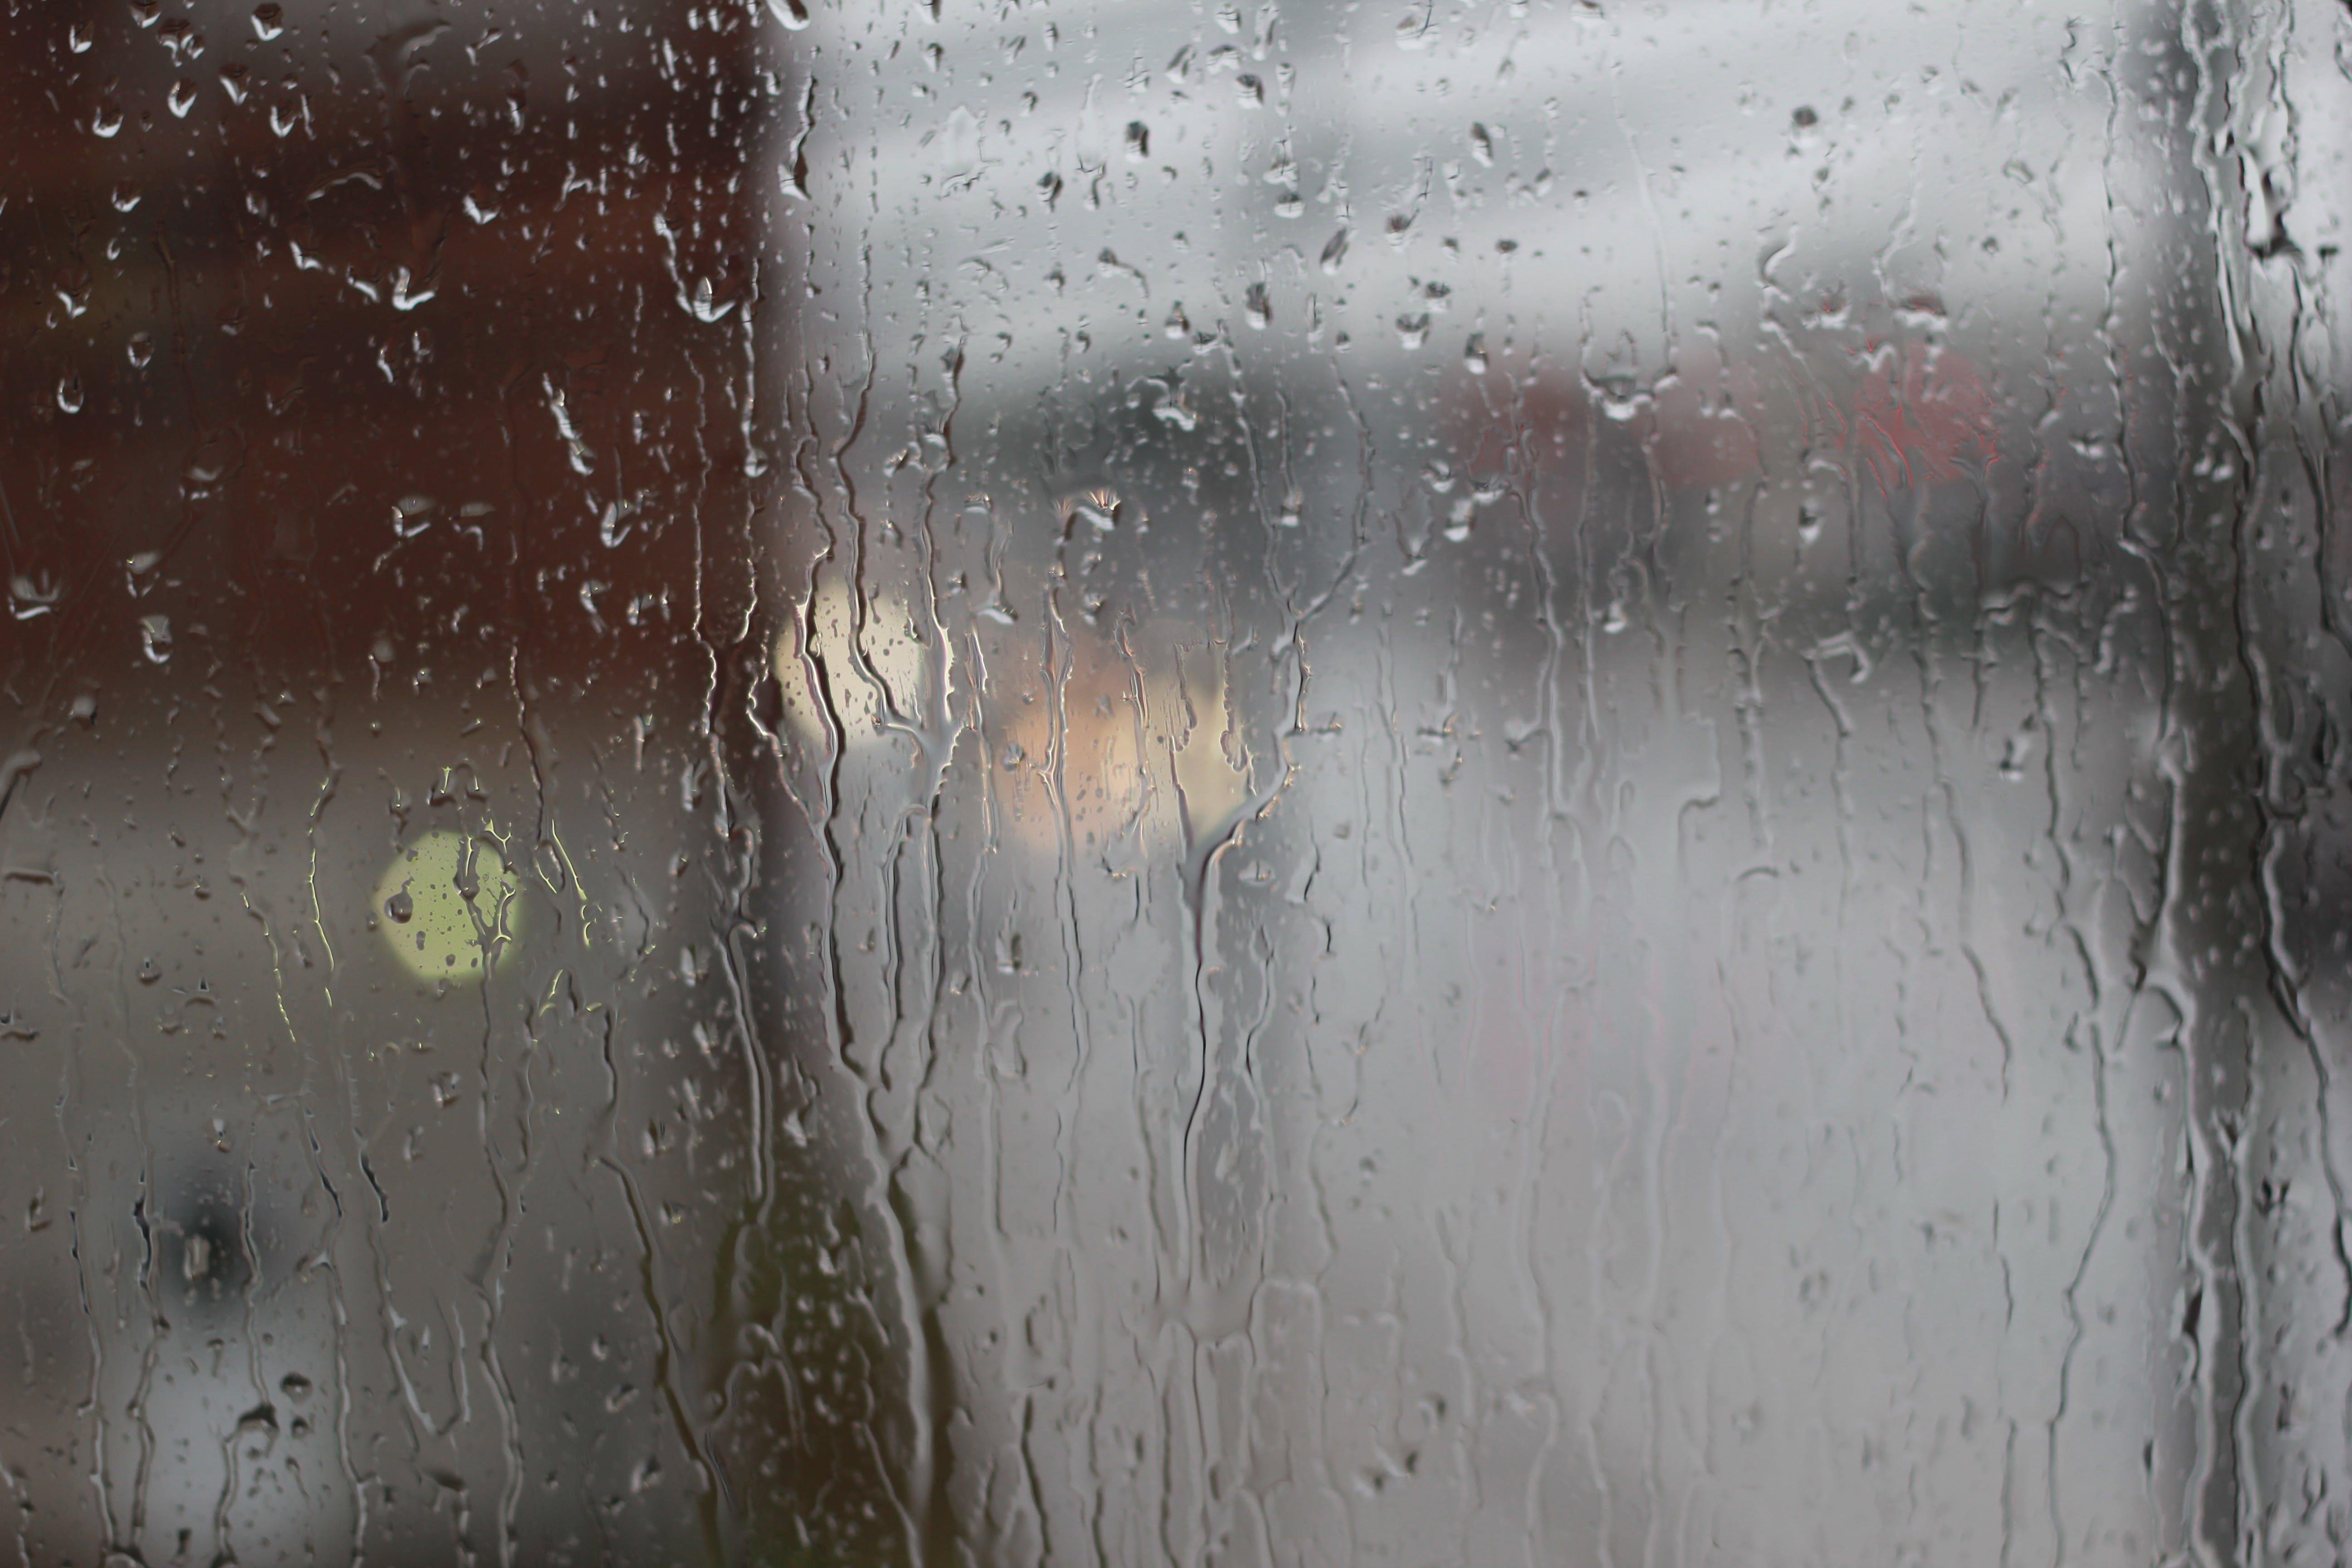 Free stock photo of drops of water, rain, raindrops, water